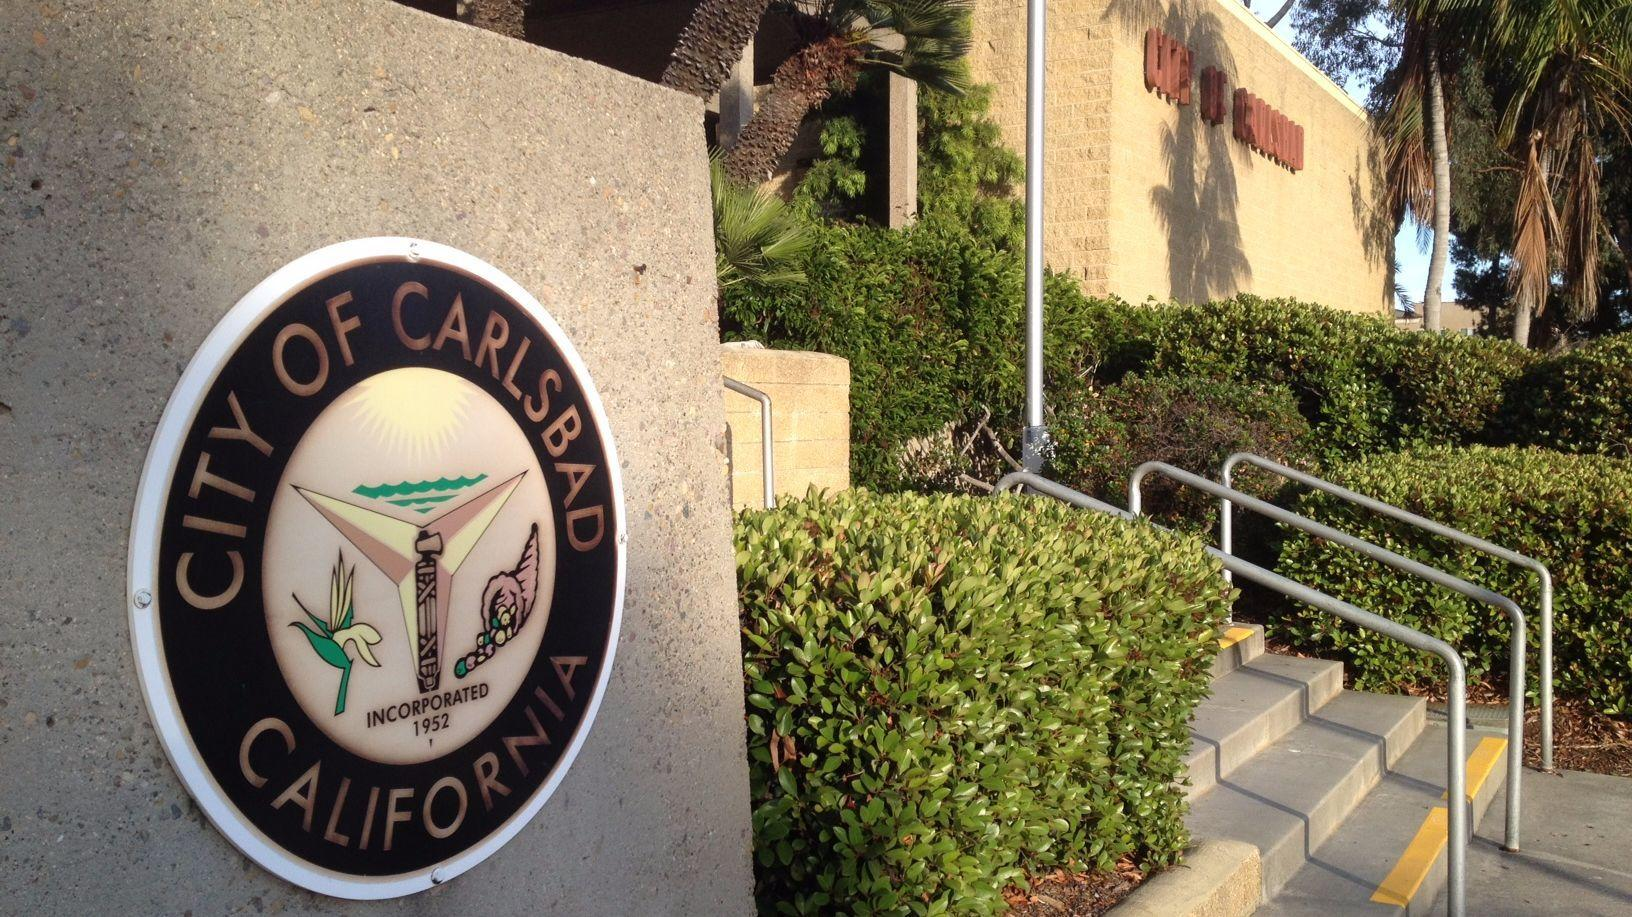 Carlsbad City Hall